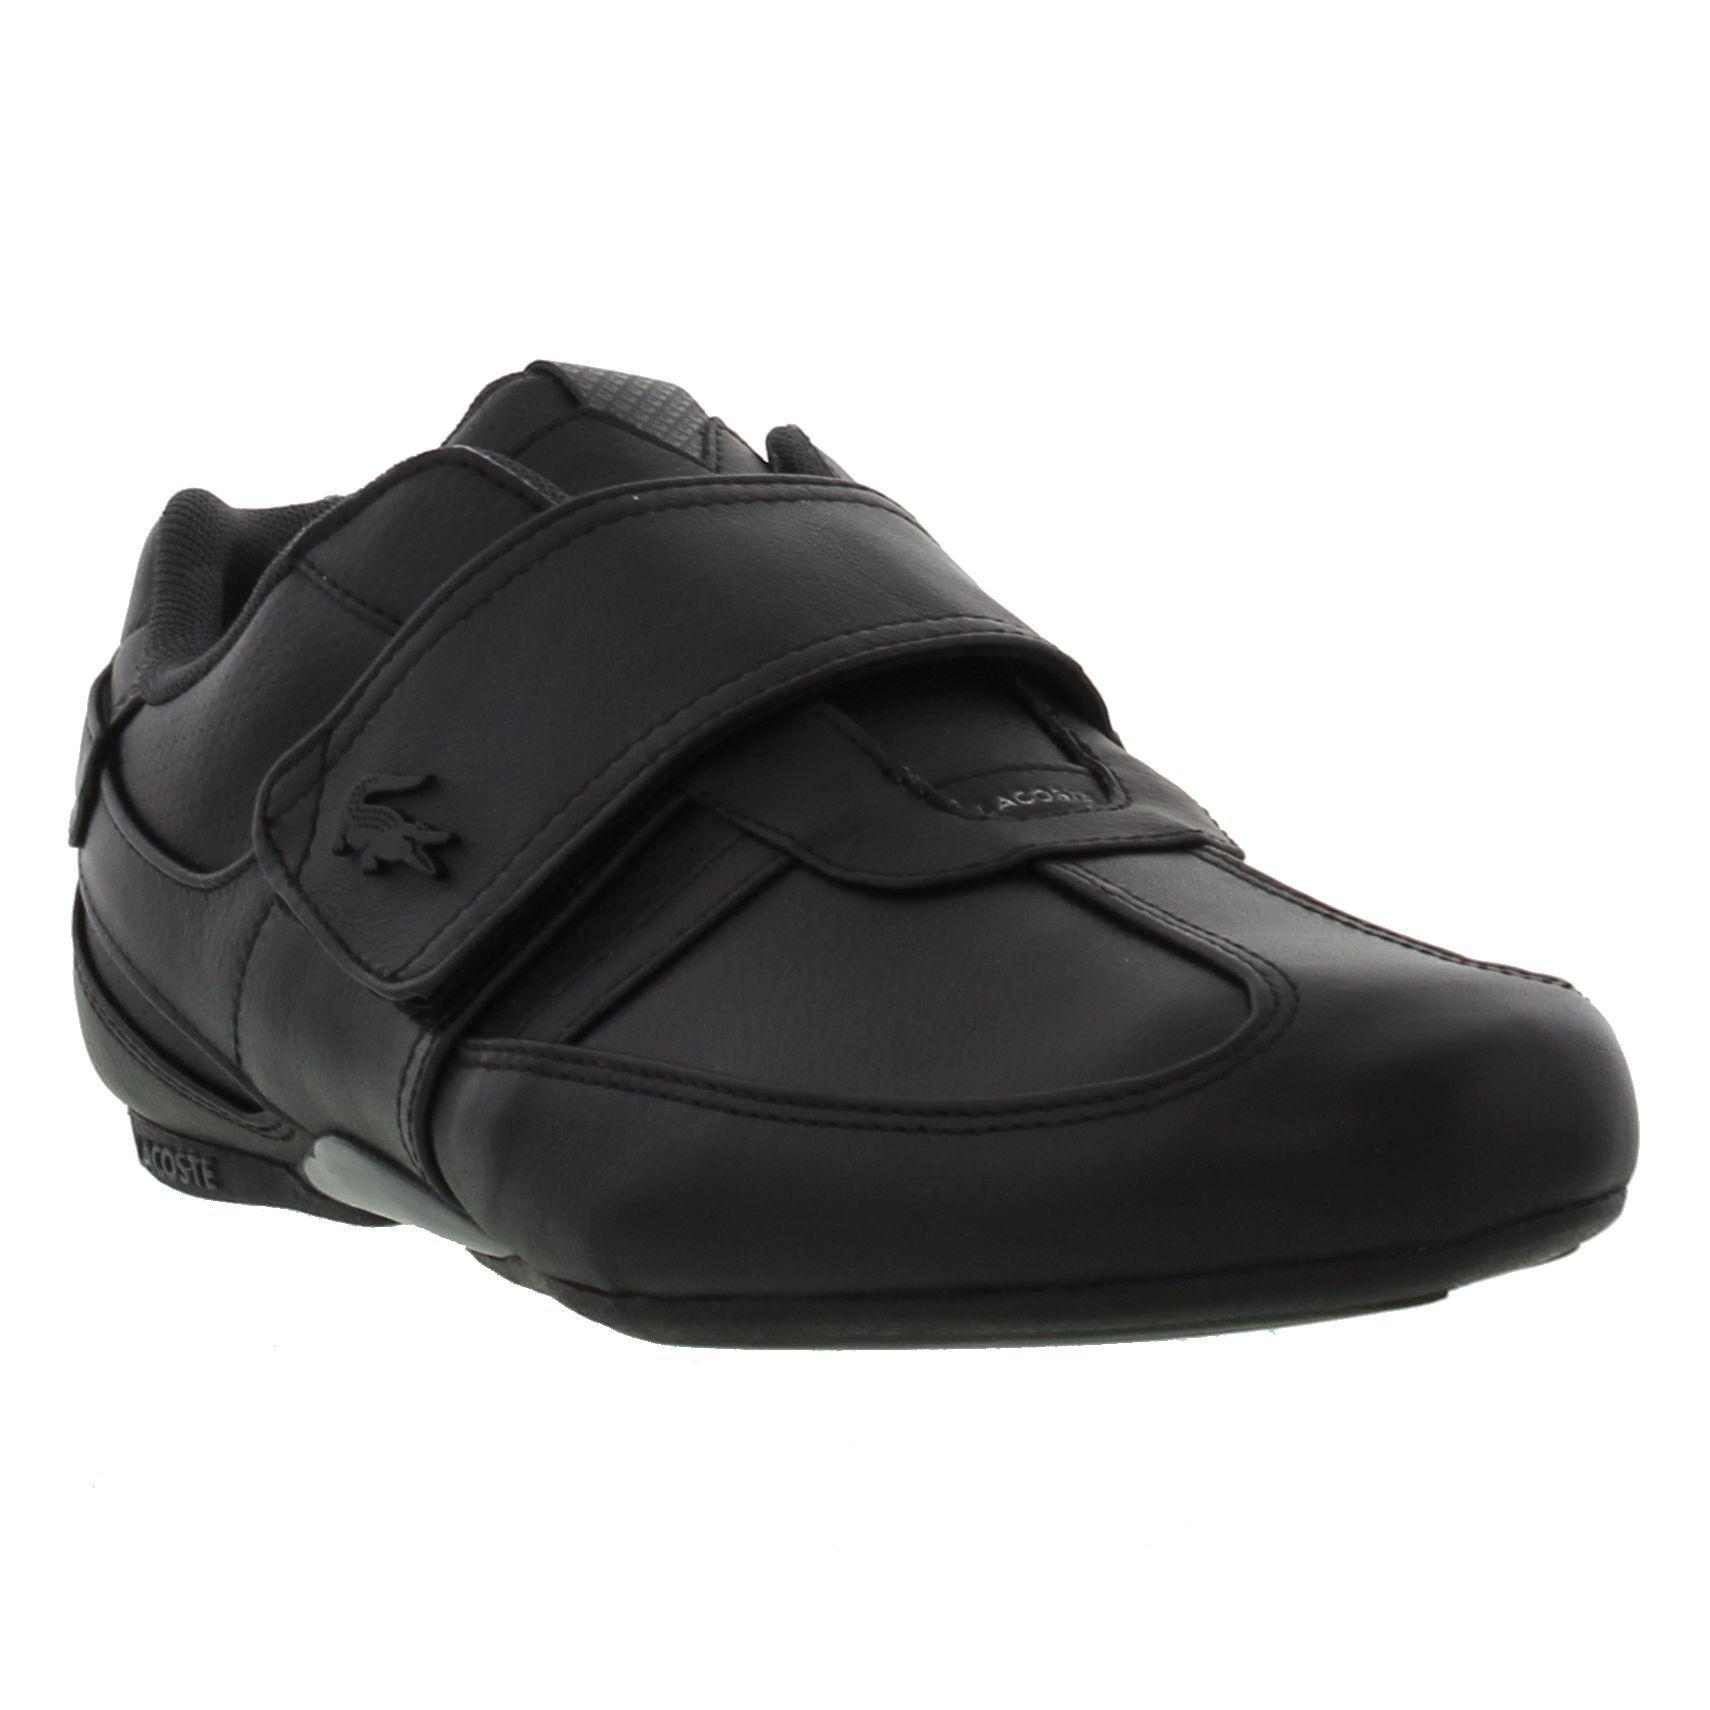 7a1c7eb6cbbb5e Lacoste Mens Protected PRM US SPM Trainers Black Black - £67.95 ...